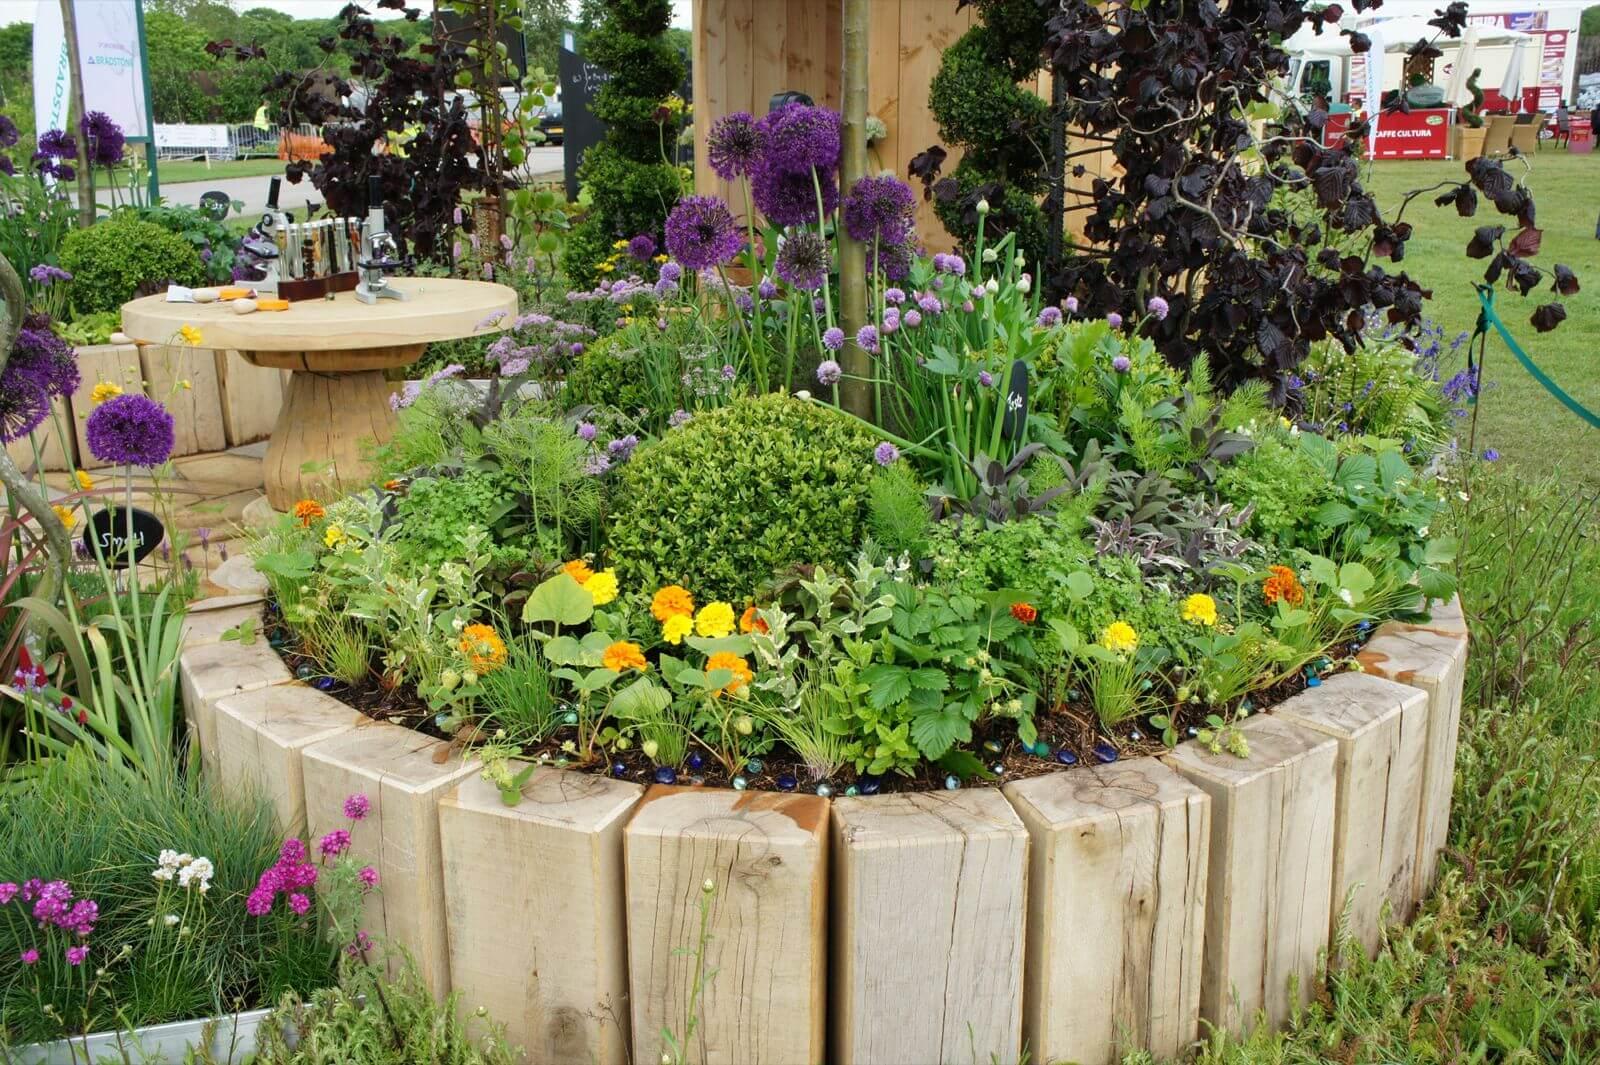 DIY Wood Flower and Herb Bed